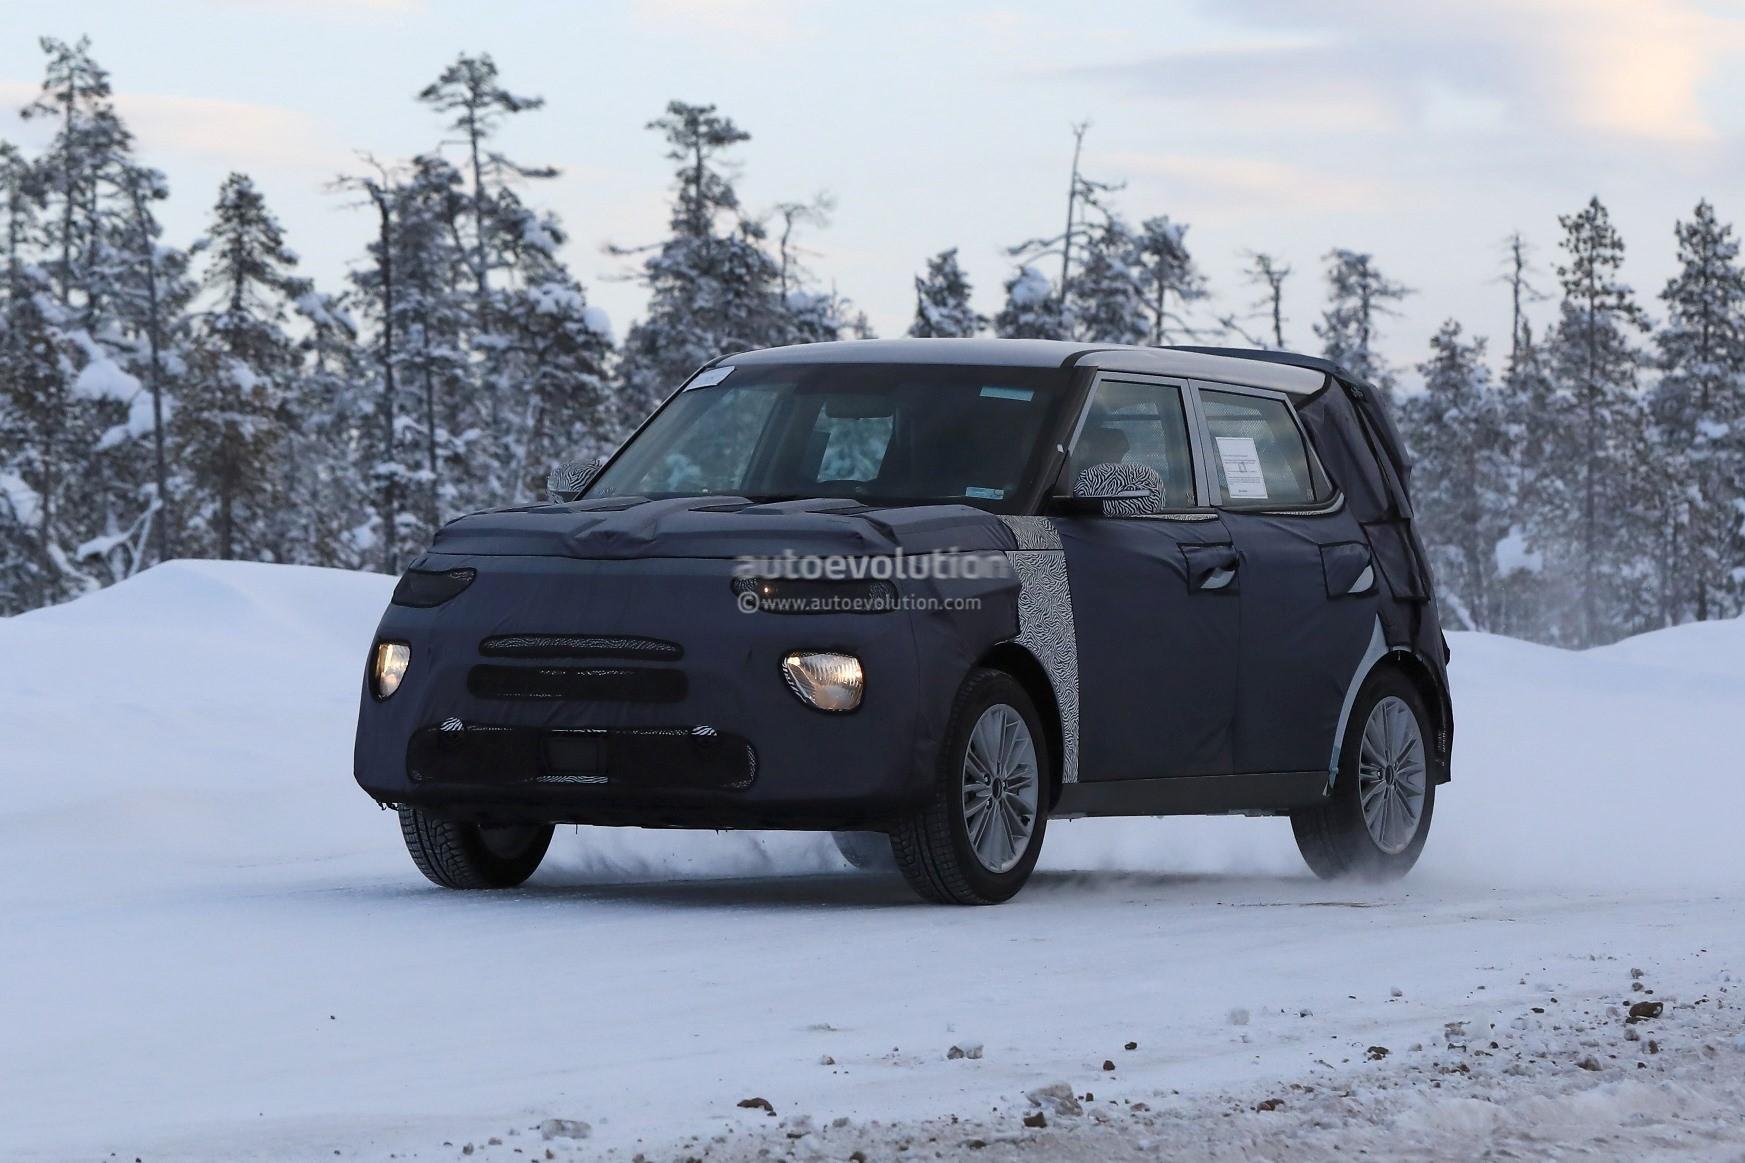 2020 Kia Soul EV To Share Platform With Hyundai Kona ...